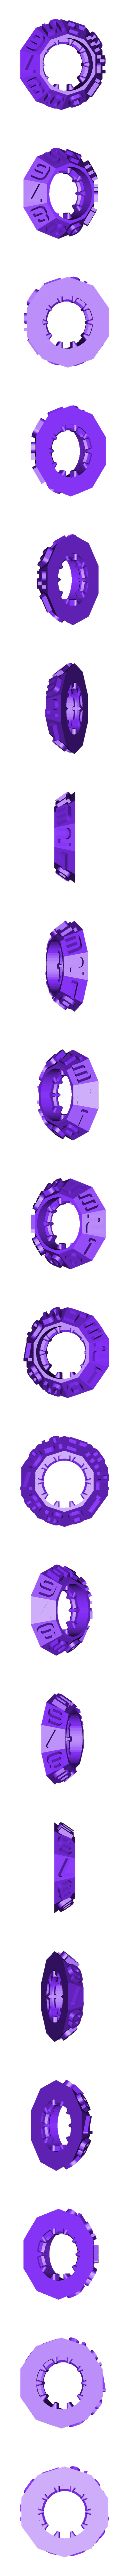 4R-5L.stl Download free STL file Latch Cryptex - Cerrojo • 3D printable design, xutano